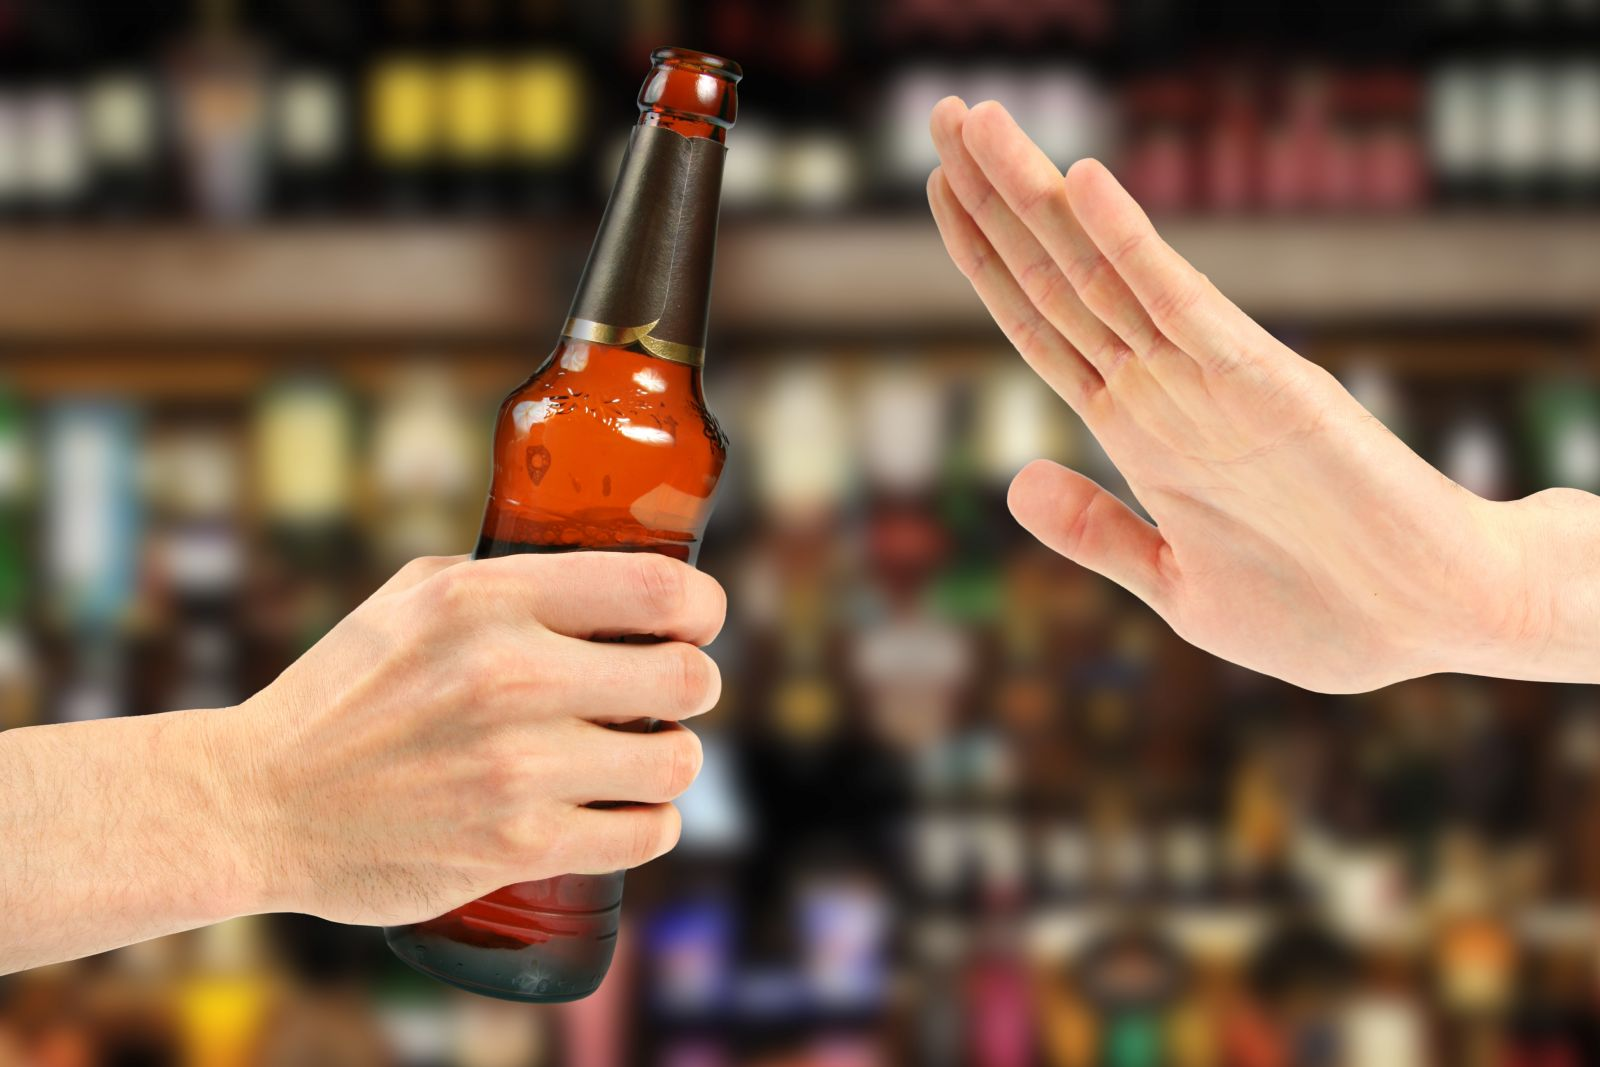 7-alkol-cilt-dusmani.jpg